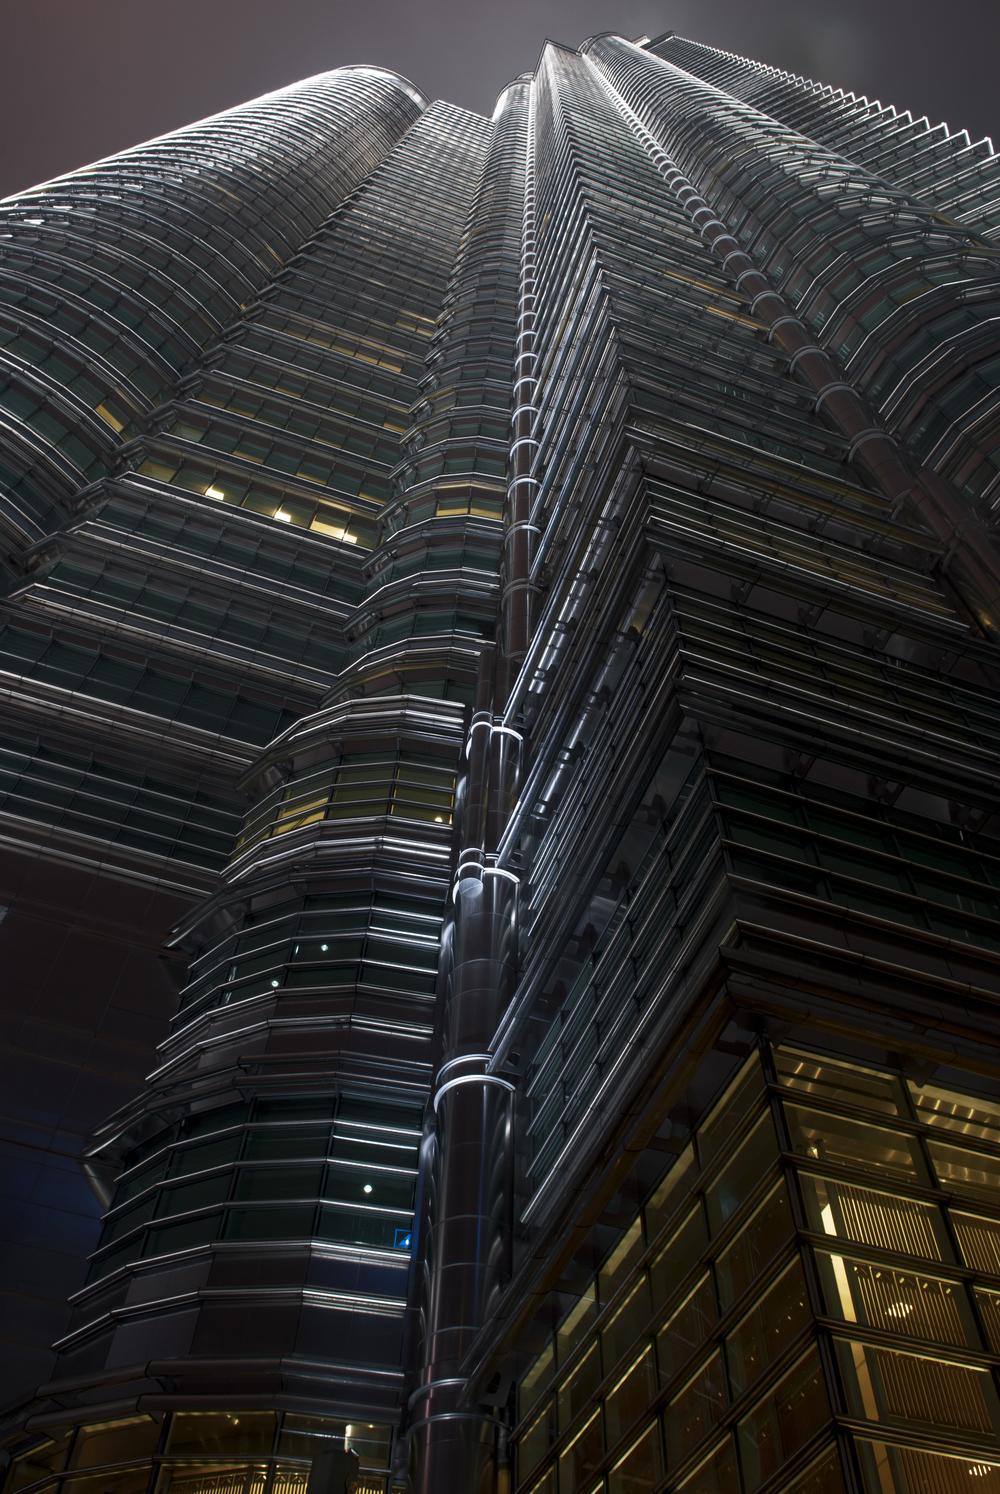 Malasia.jpg